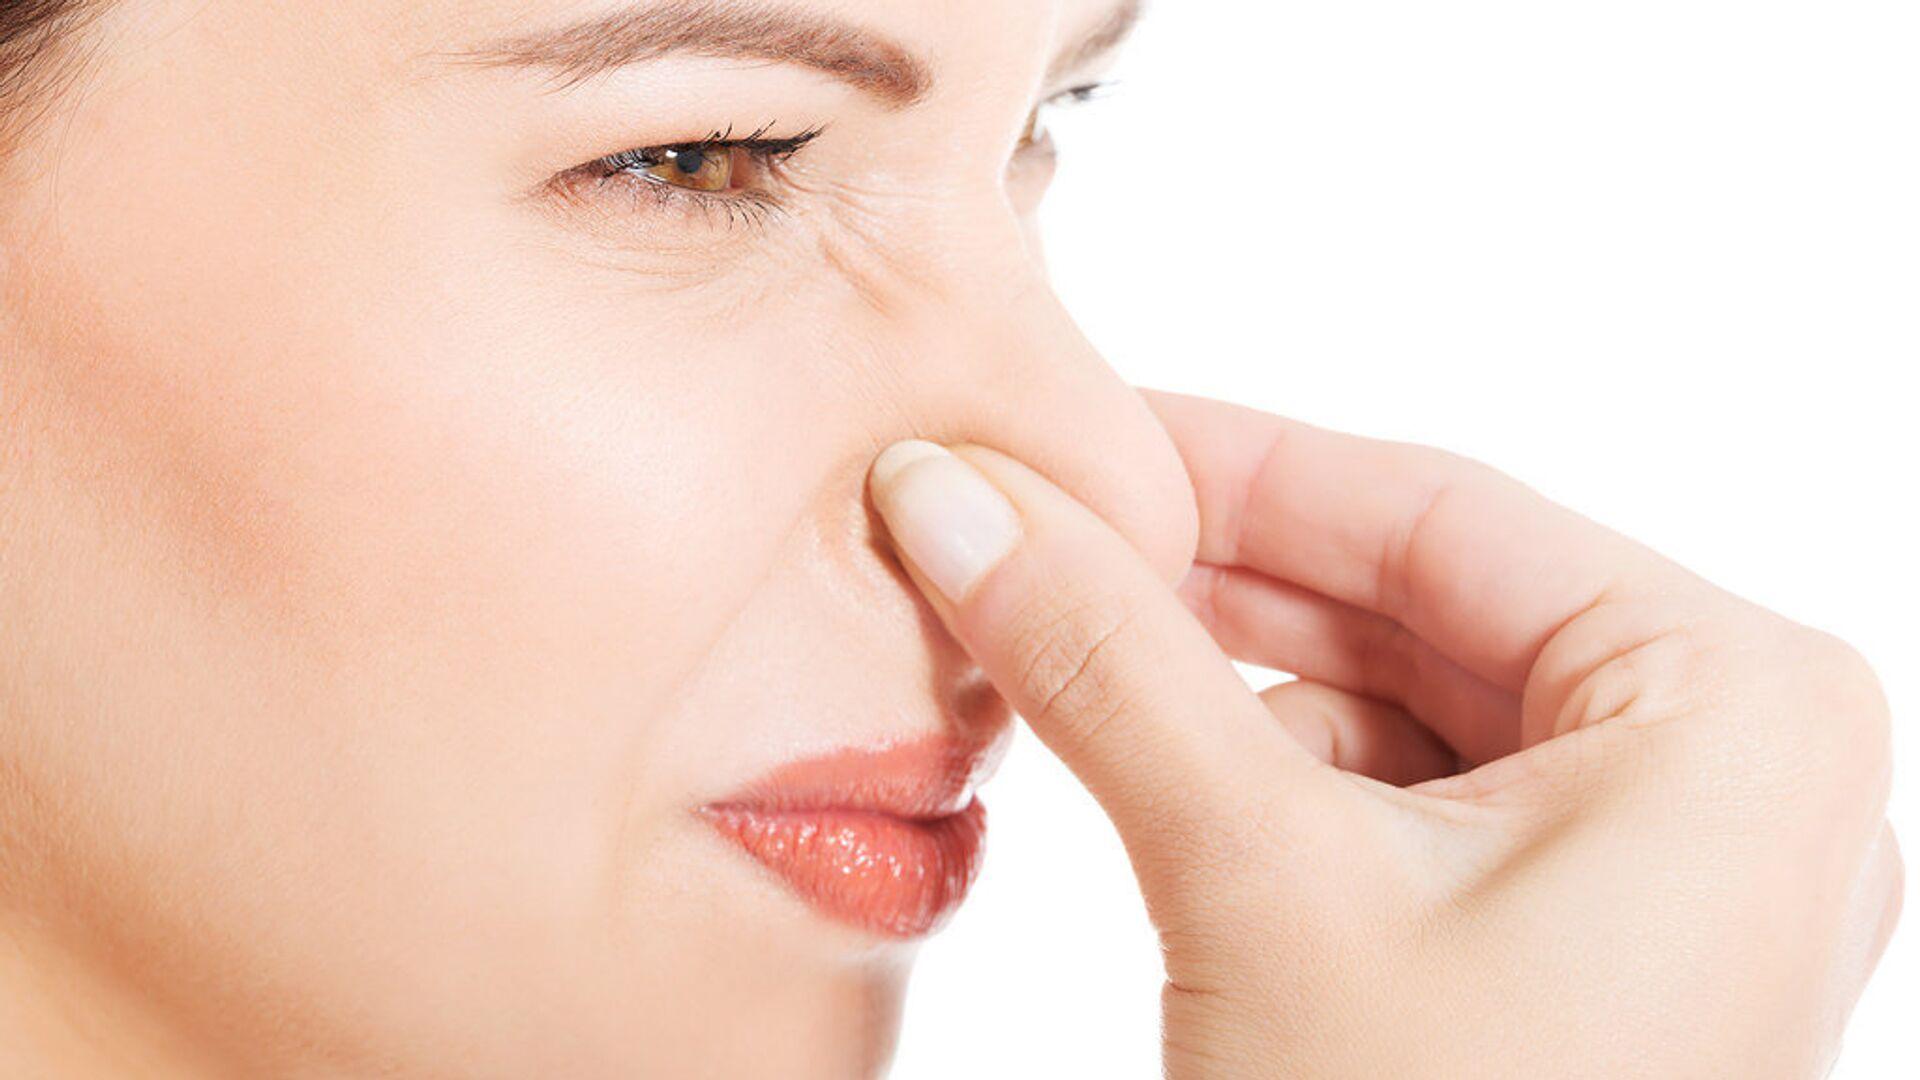 Mujer se tapa la nariz por el olor. - Sputnik Mundo, 1920, 09.04.2021